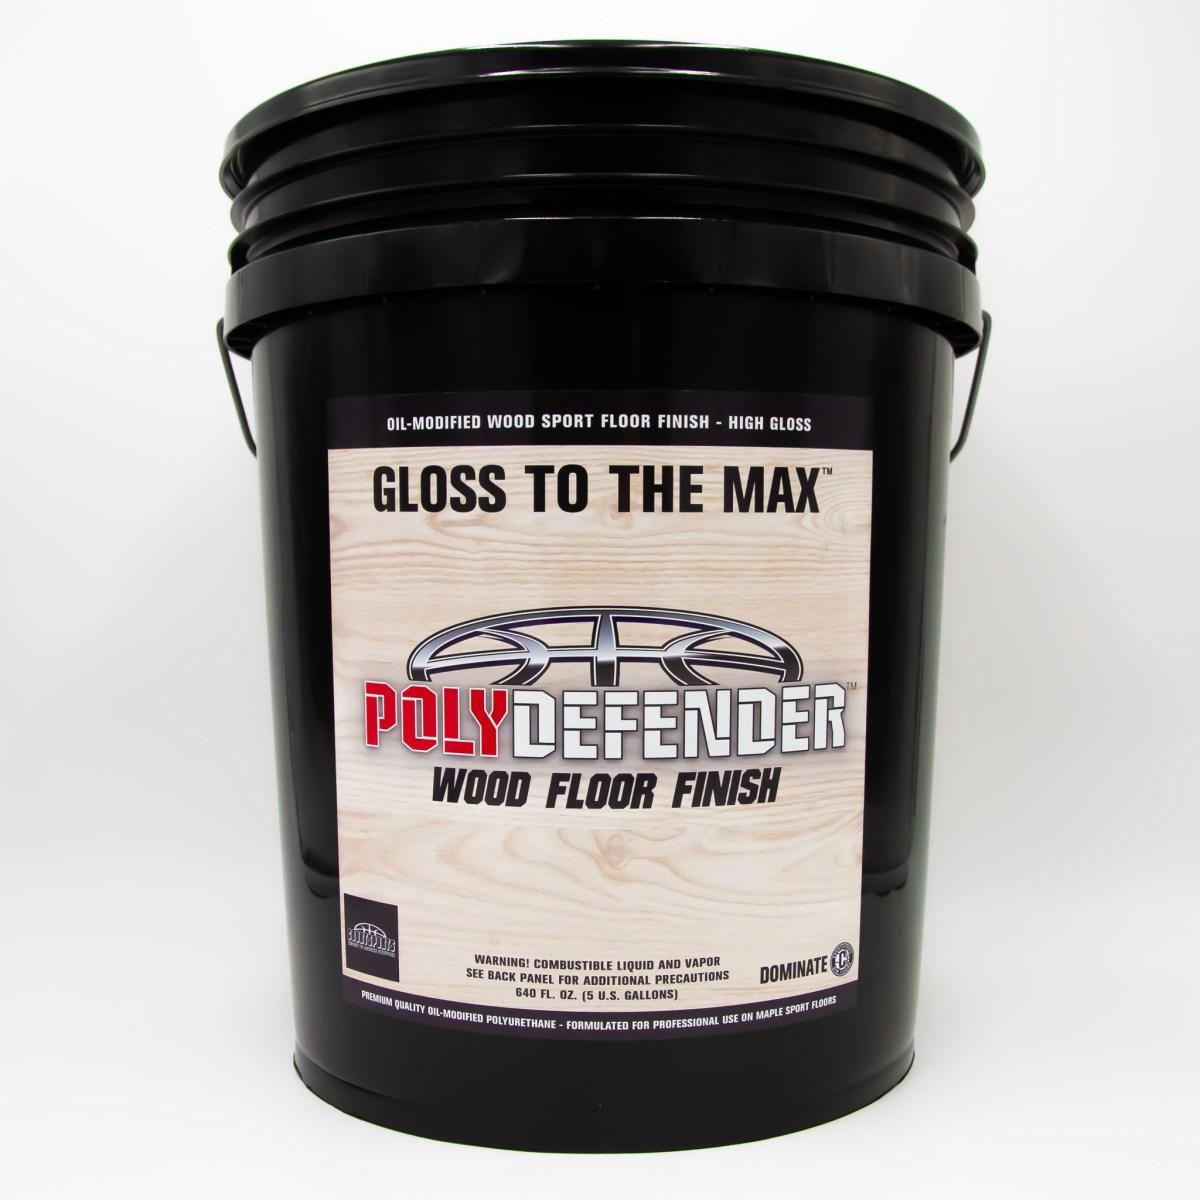 POLYDEFENDER WOOD FLOOR FINISH - OIL-MODIFIED POLYURETHANE FLOOR FINISH FORMULATED FOR MAPLE SPORT FLOORS - HIGH GLOSS